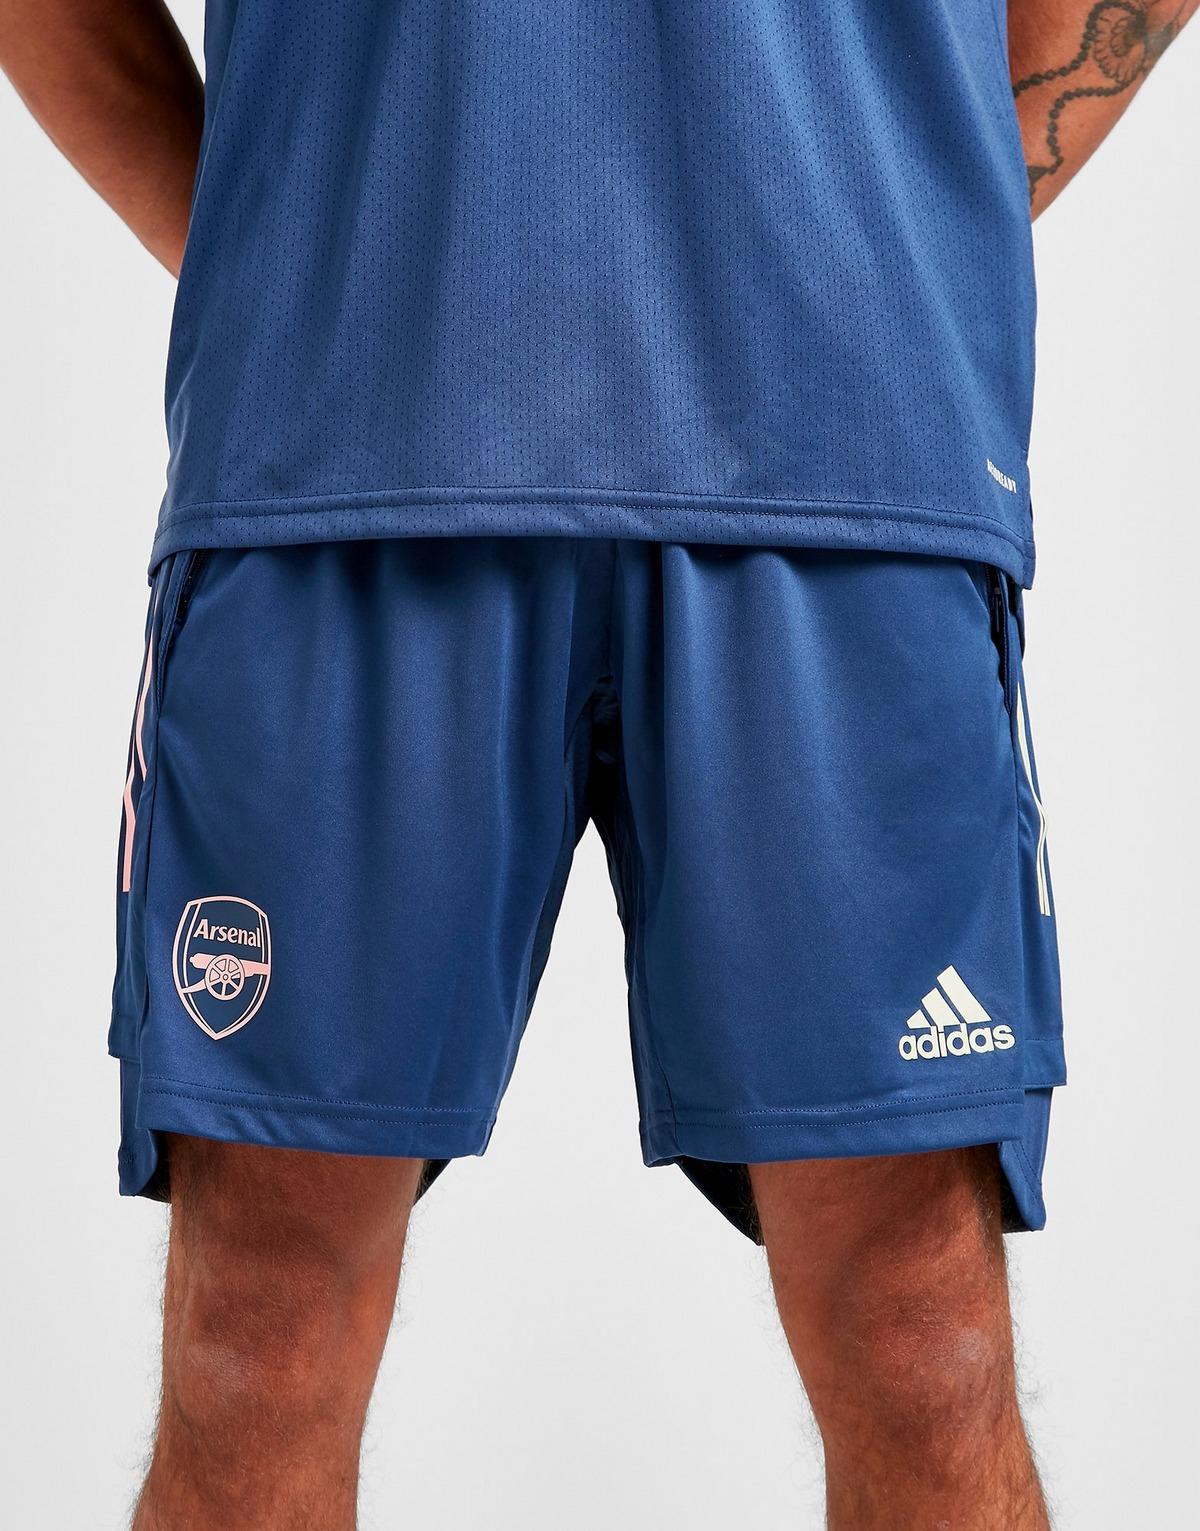 Pantalones cortos Adidas Arsenal con bolsillos de cremallera por 5€